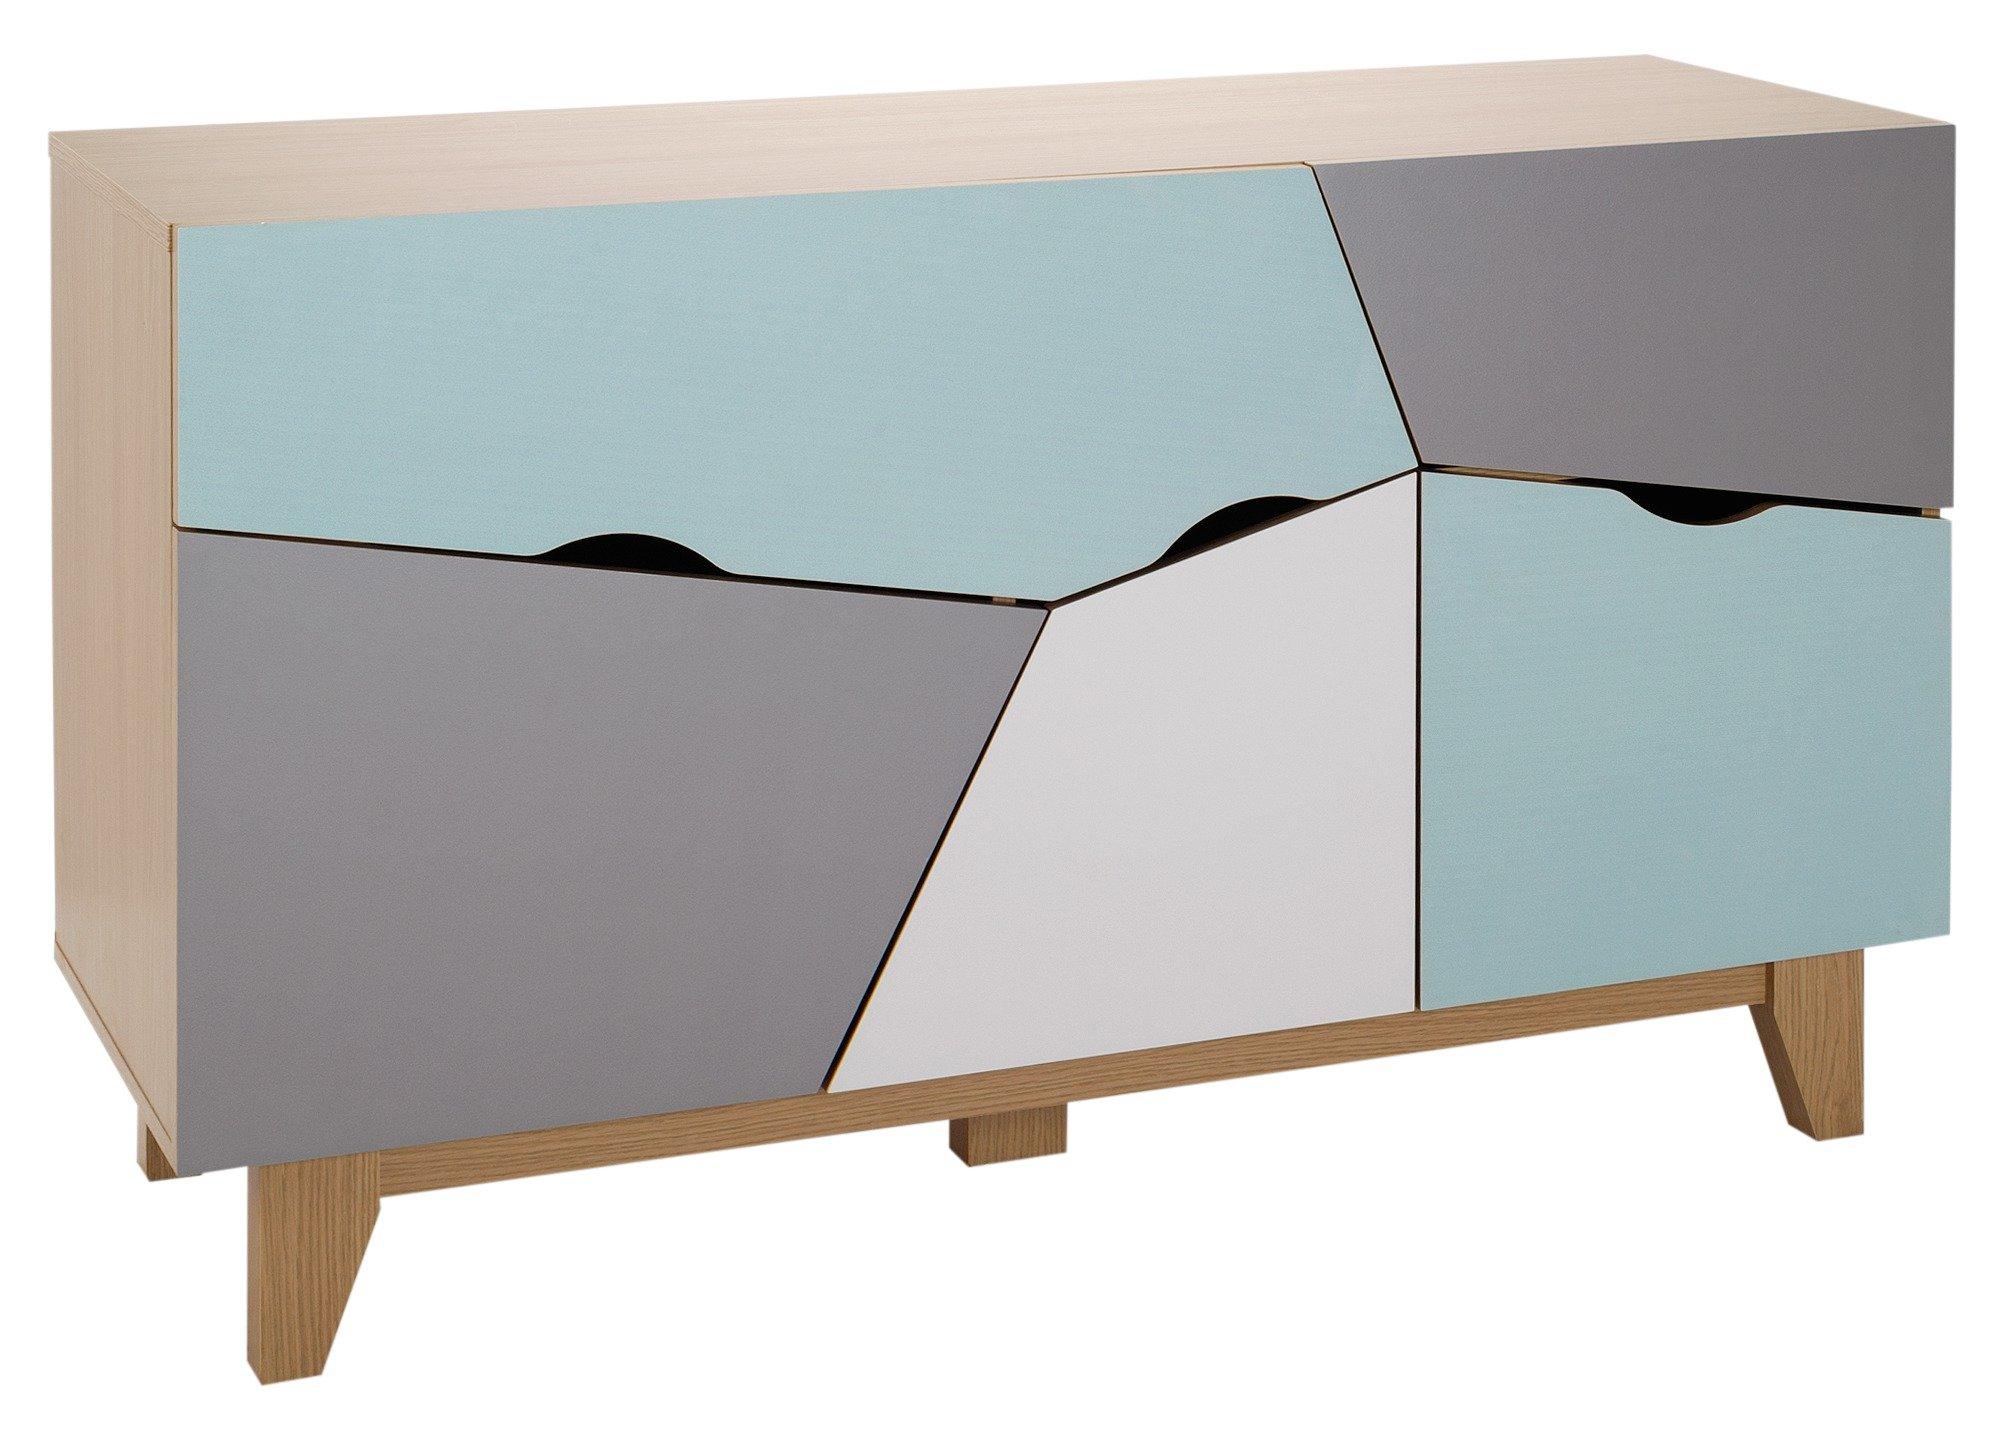 Argos Home 3 Door 2 Drawer Sideboard - Multicoloured